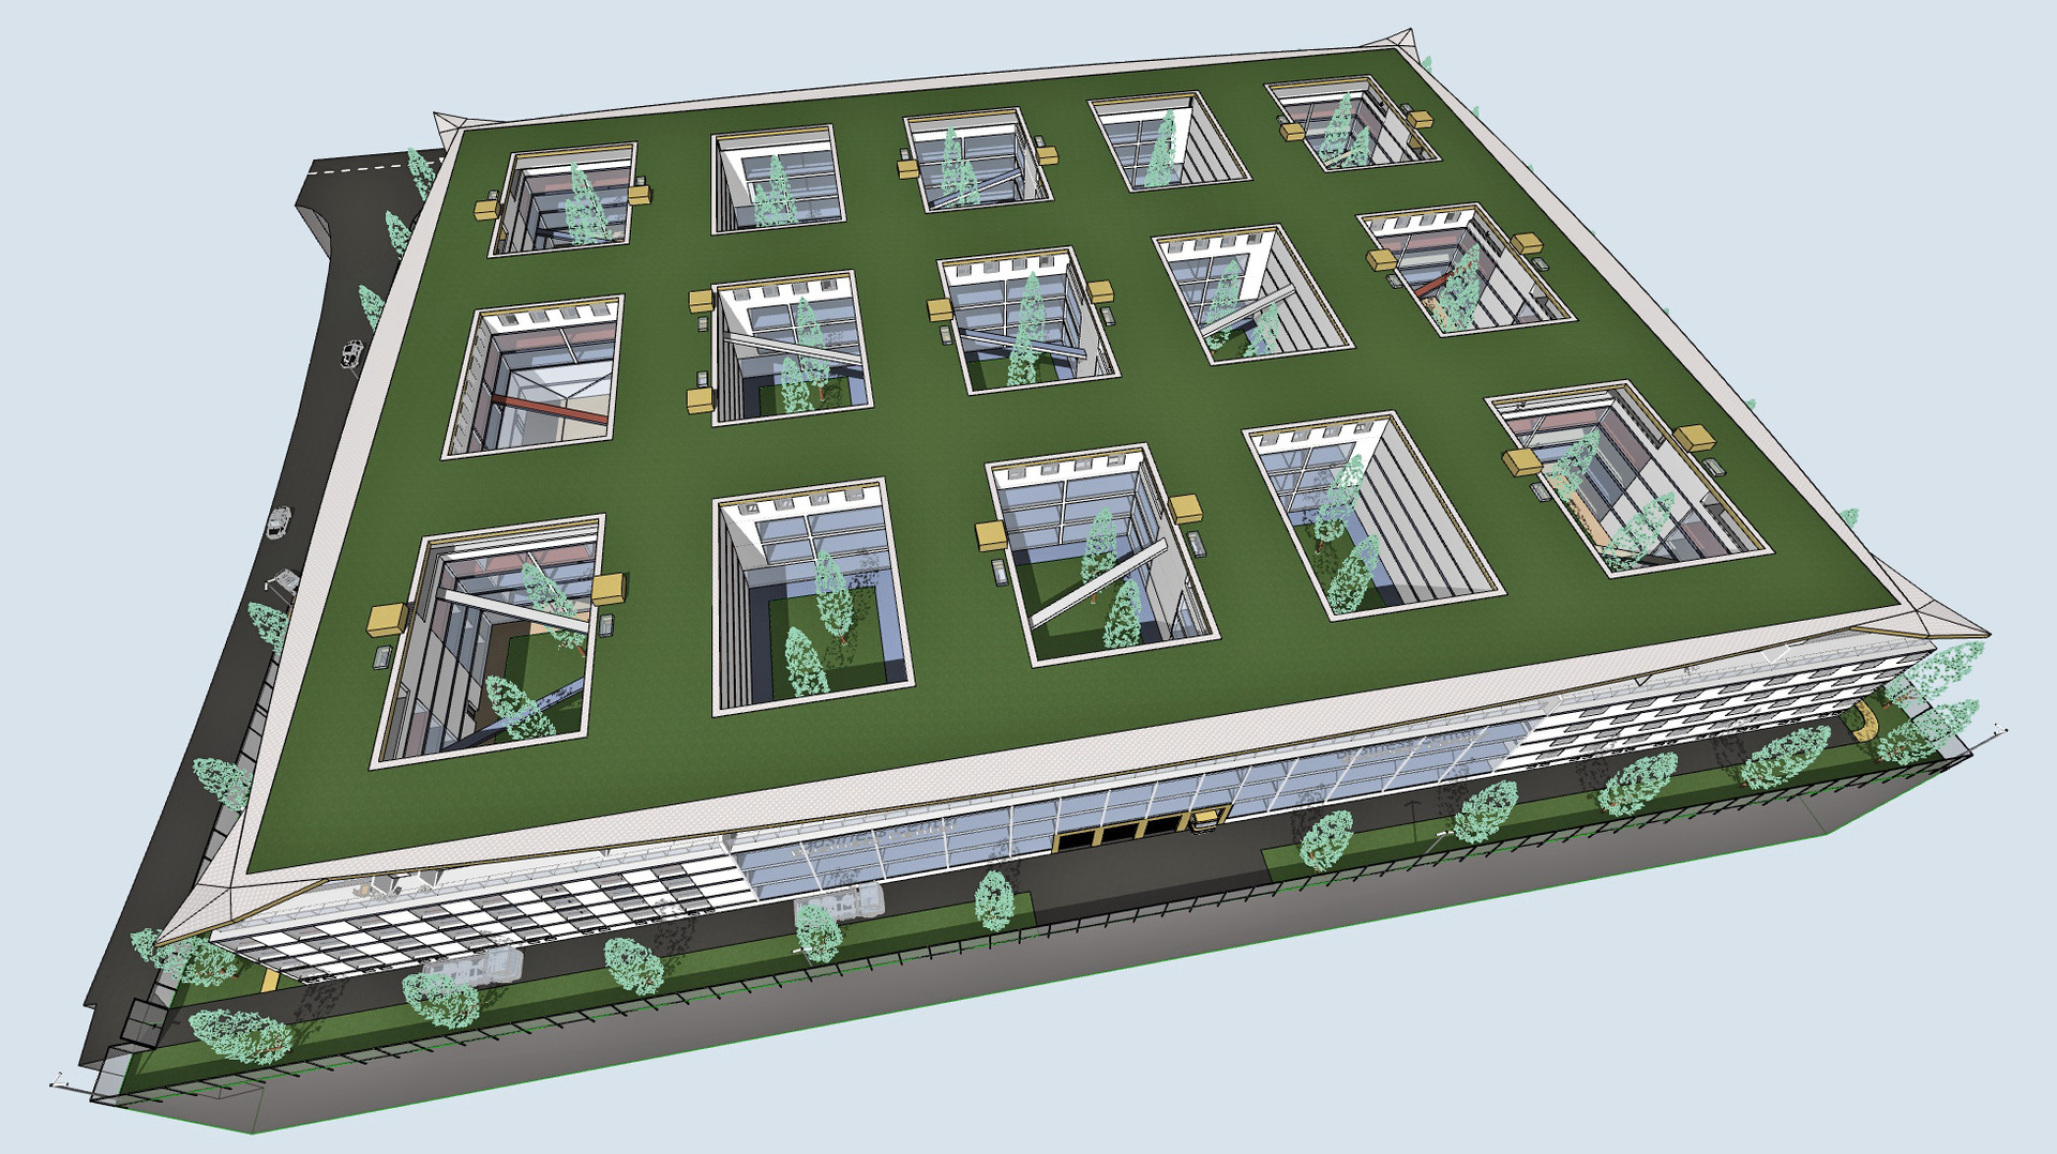 Perspektive Pharma Business Center Switzerland for sale - 45.000 sqm to 94.000 sqm - Bauland Gewerbezone Arbeitszone